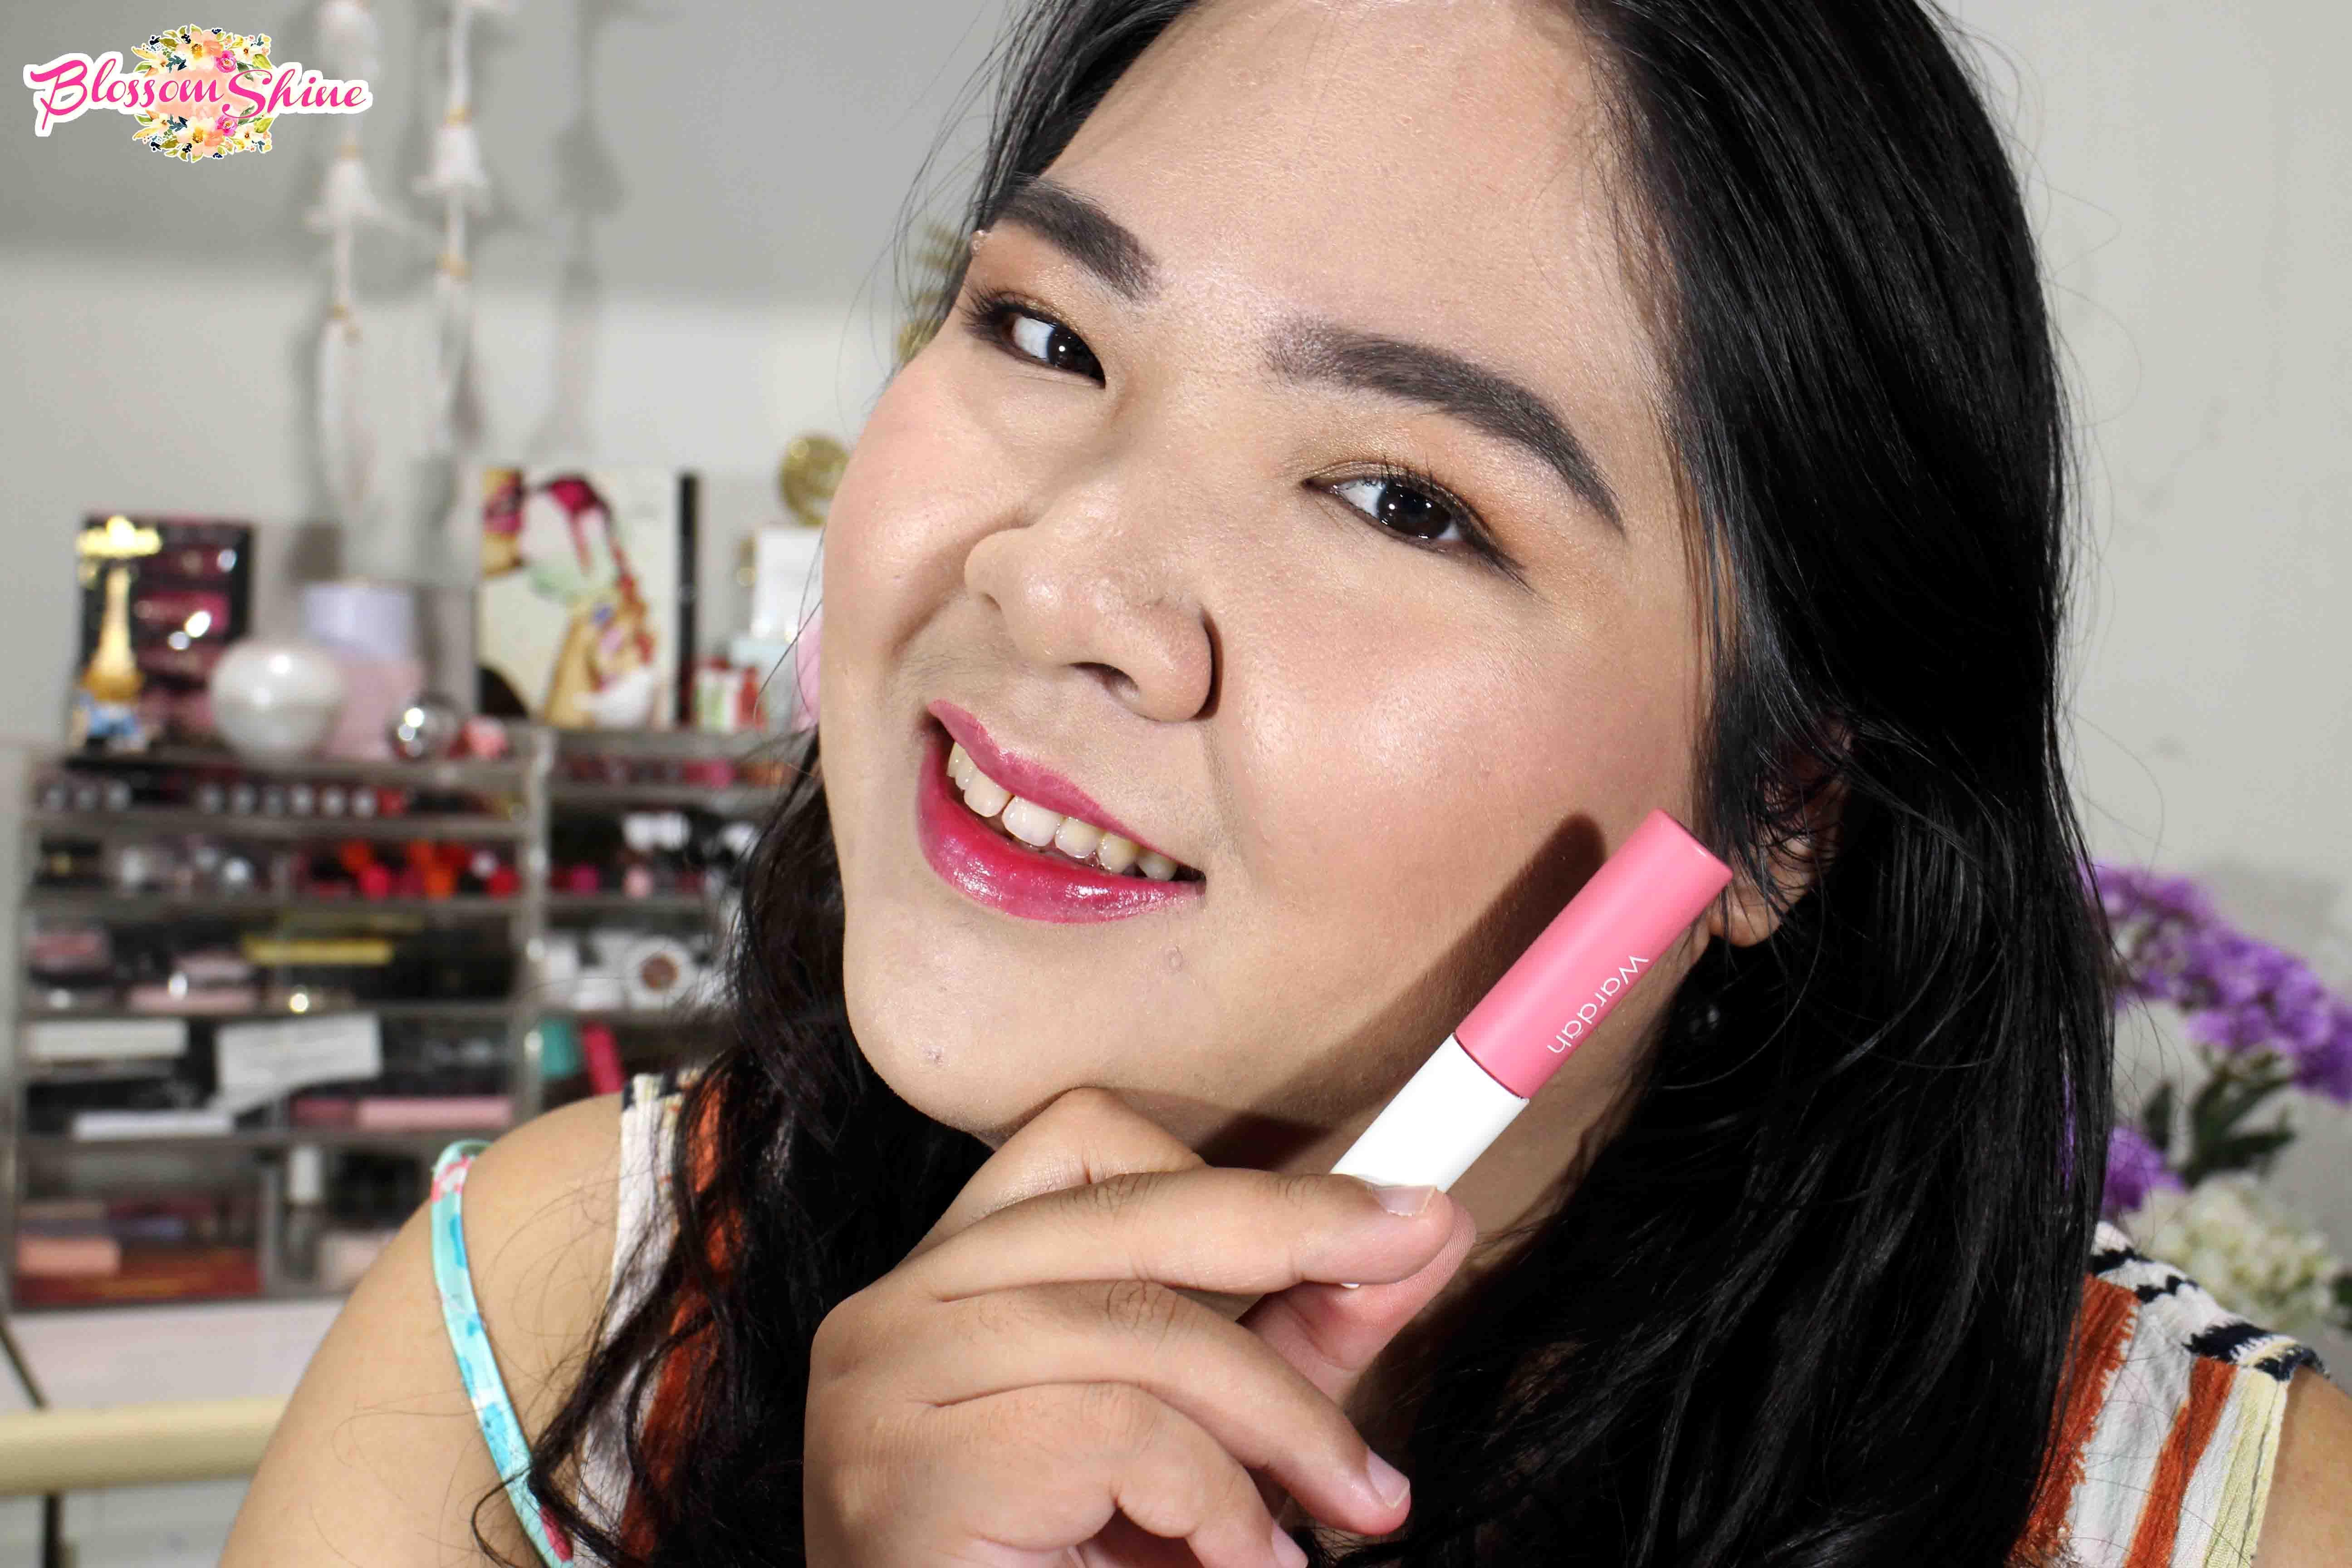 Wardah Cheek Liptint Blossomshine 01 Shade 03 Pink On Point New Wardahcheekliptint